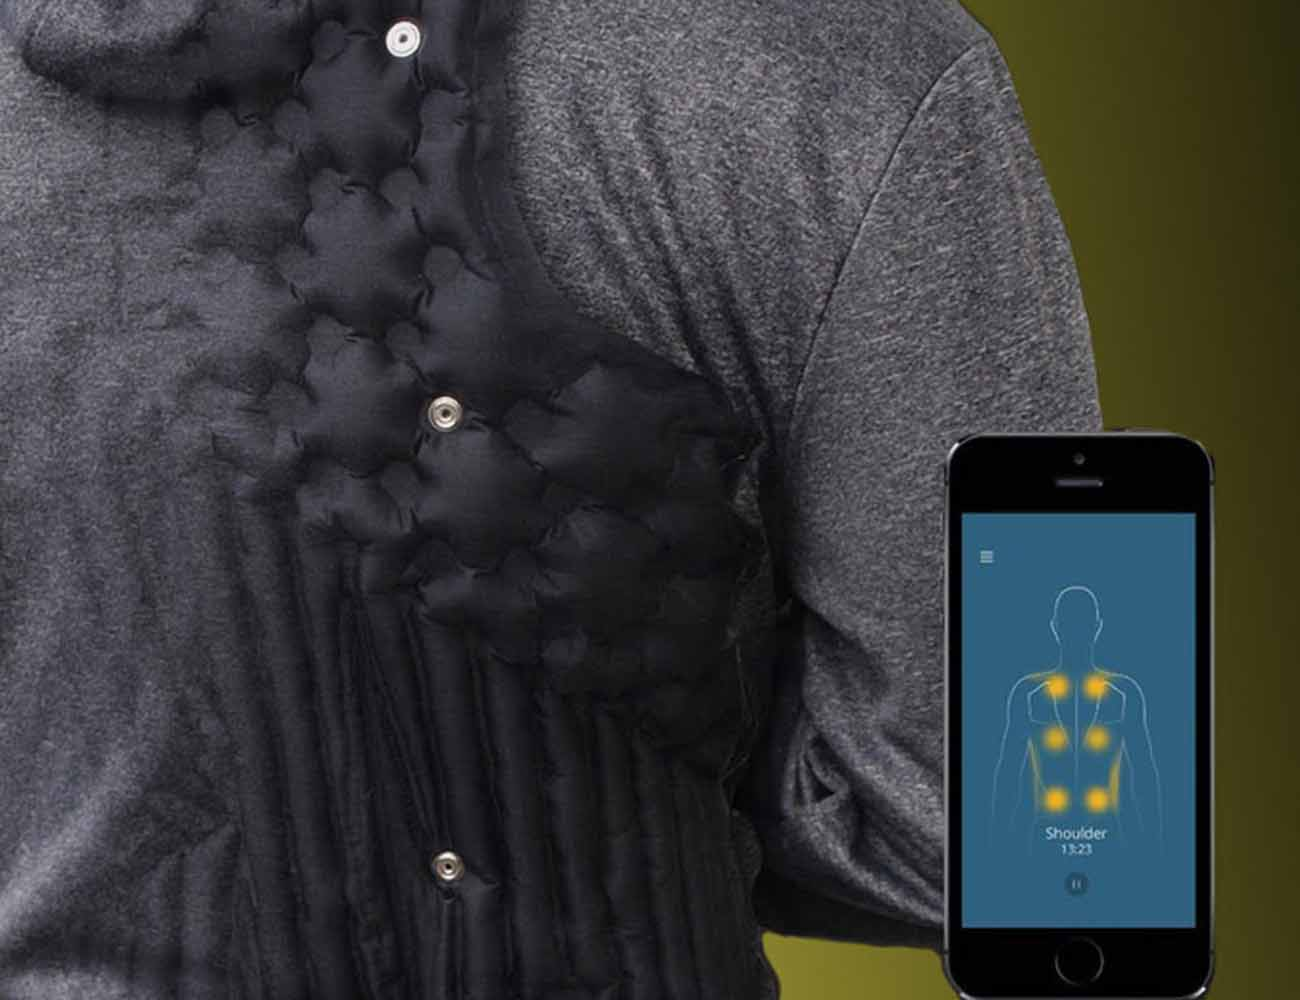 AiraWear – World's First Smart Comfort Jacket